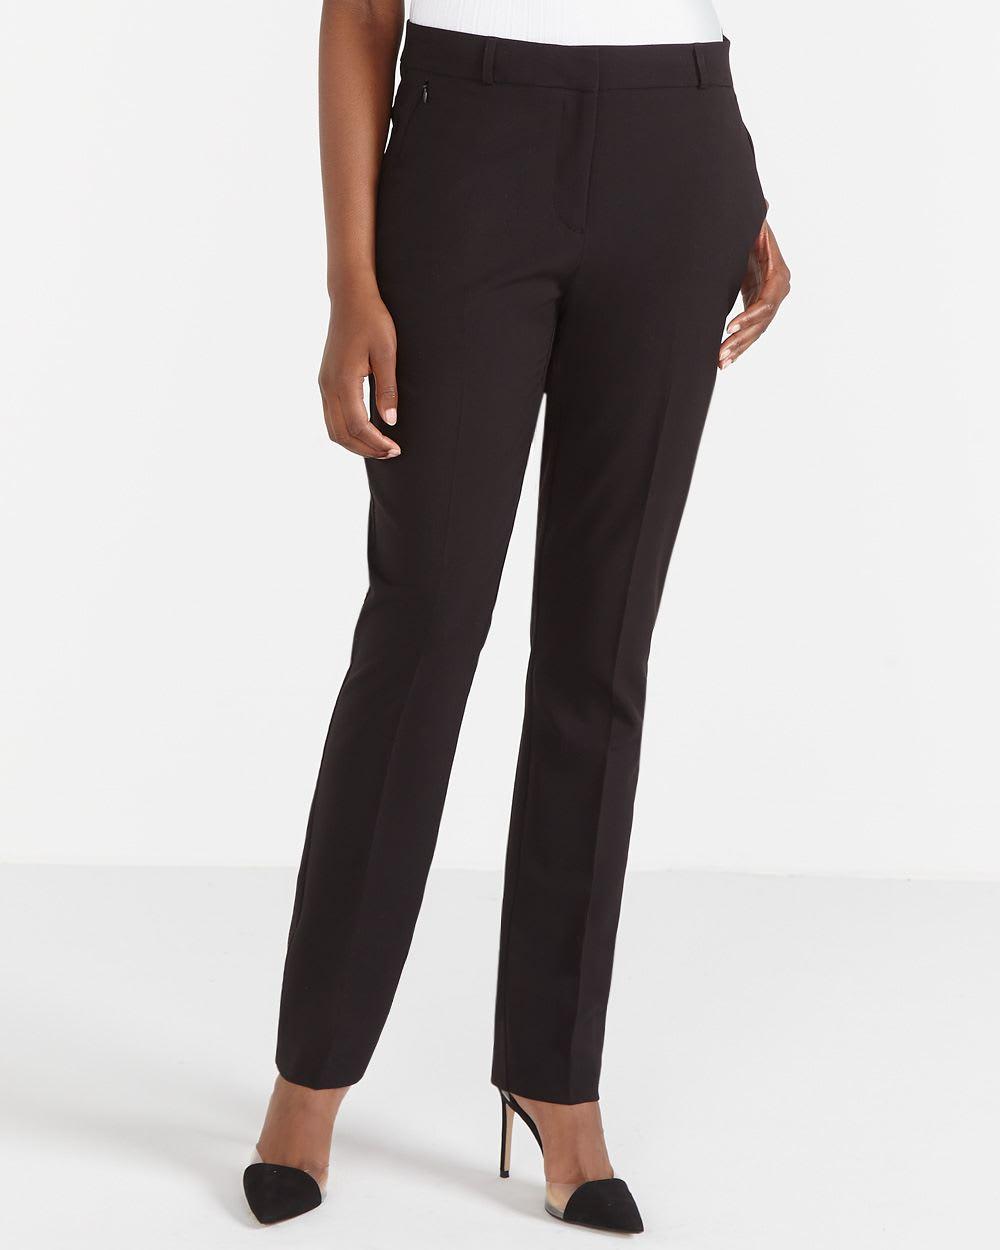 The Tall New Classic Straight Leg Pants